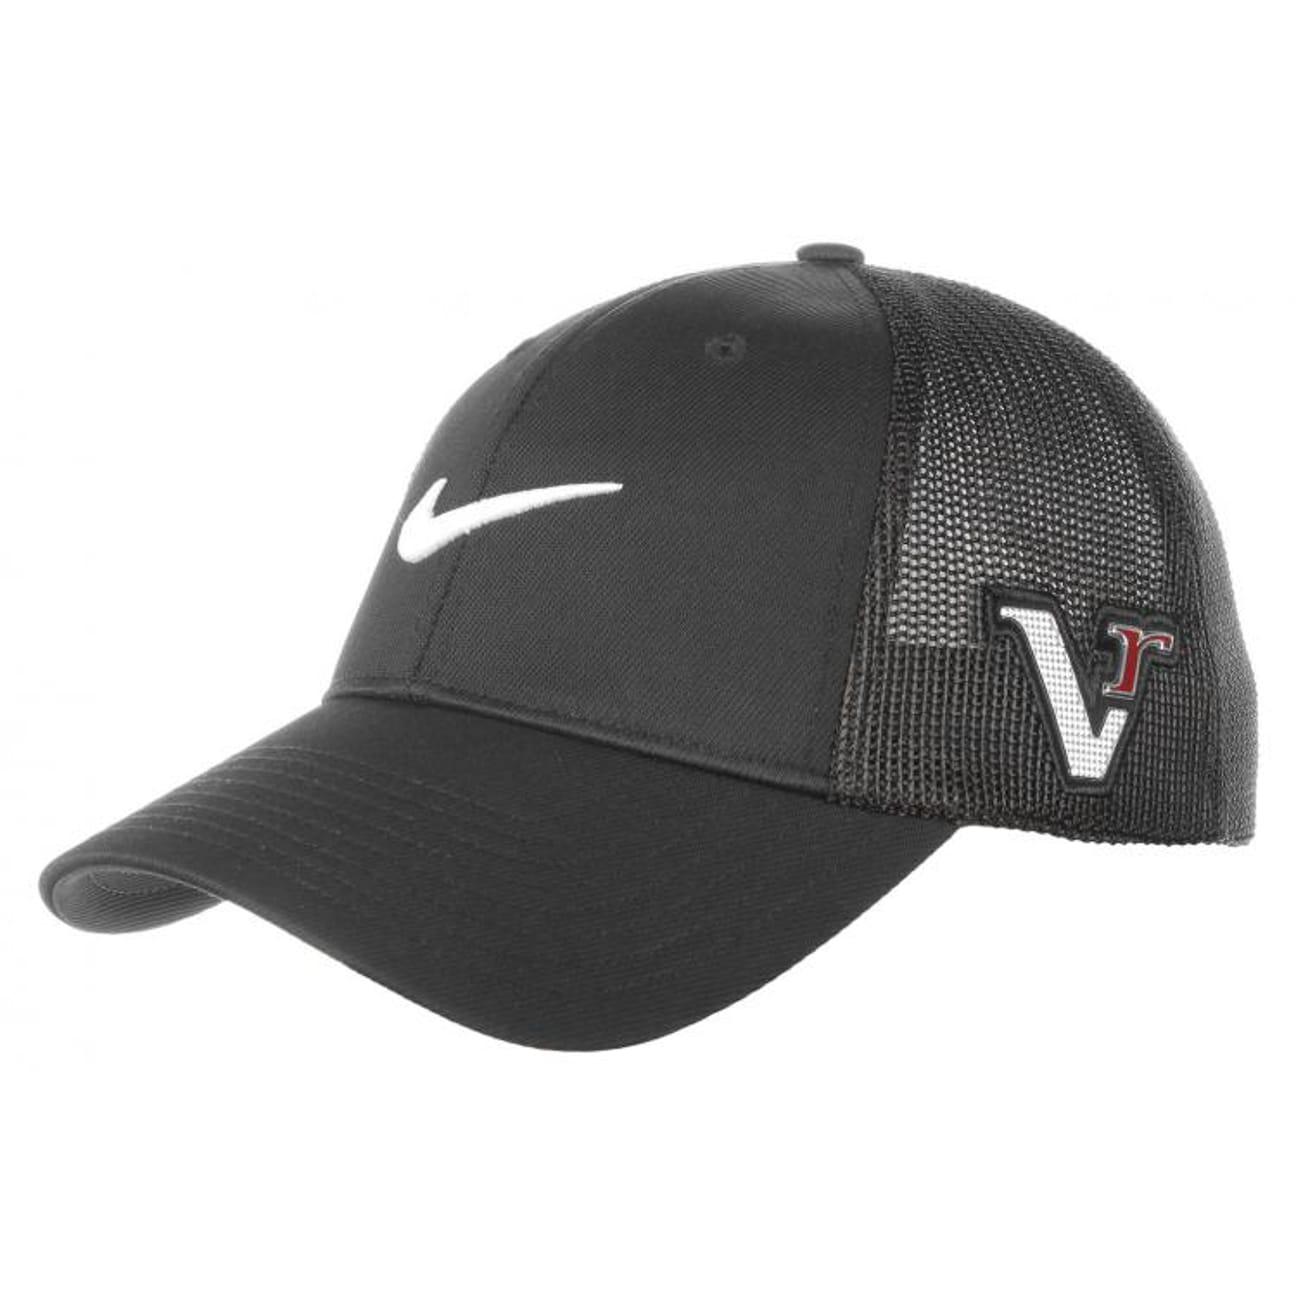 3a38b9785277d4 ... New Tour Flexfit Cap by Nike - black-black 1